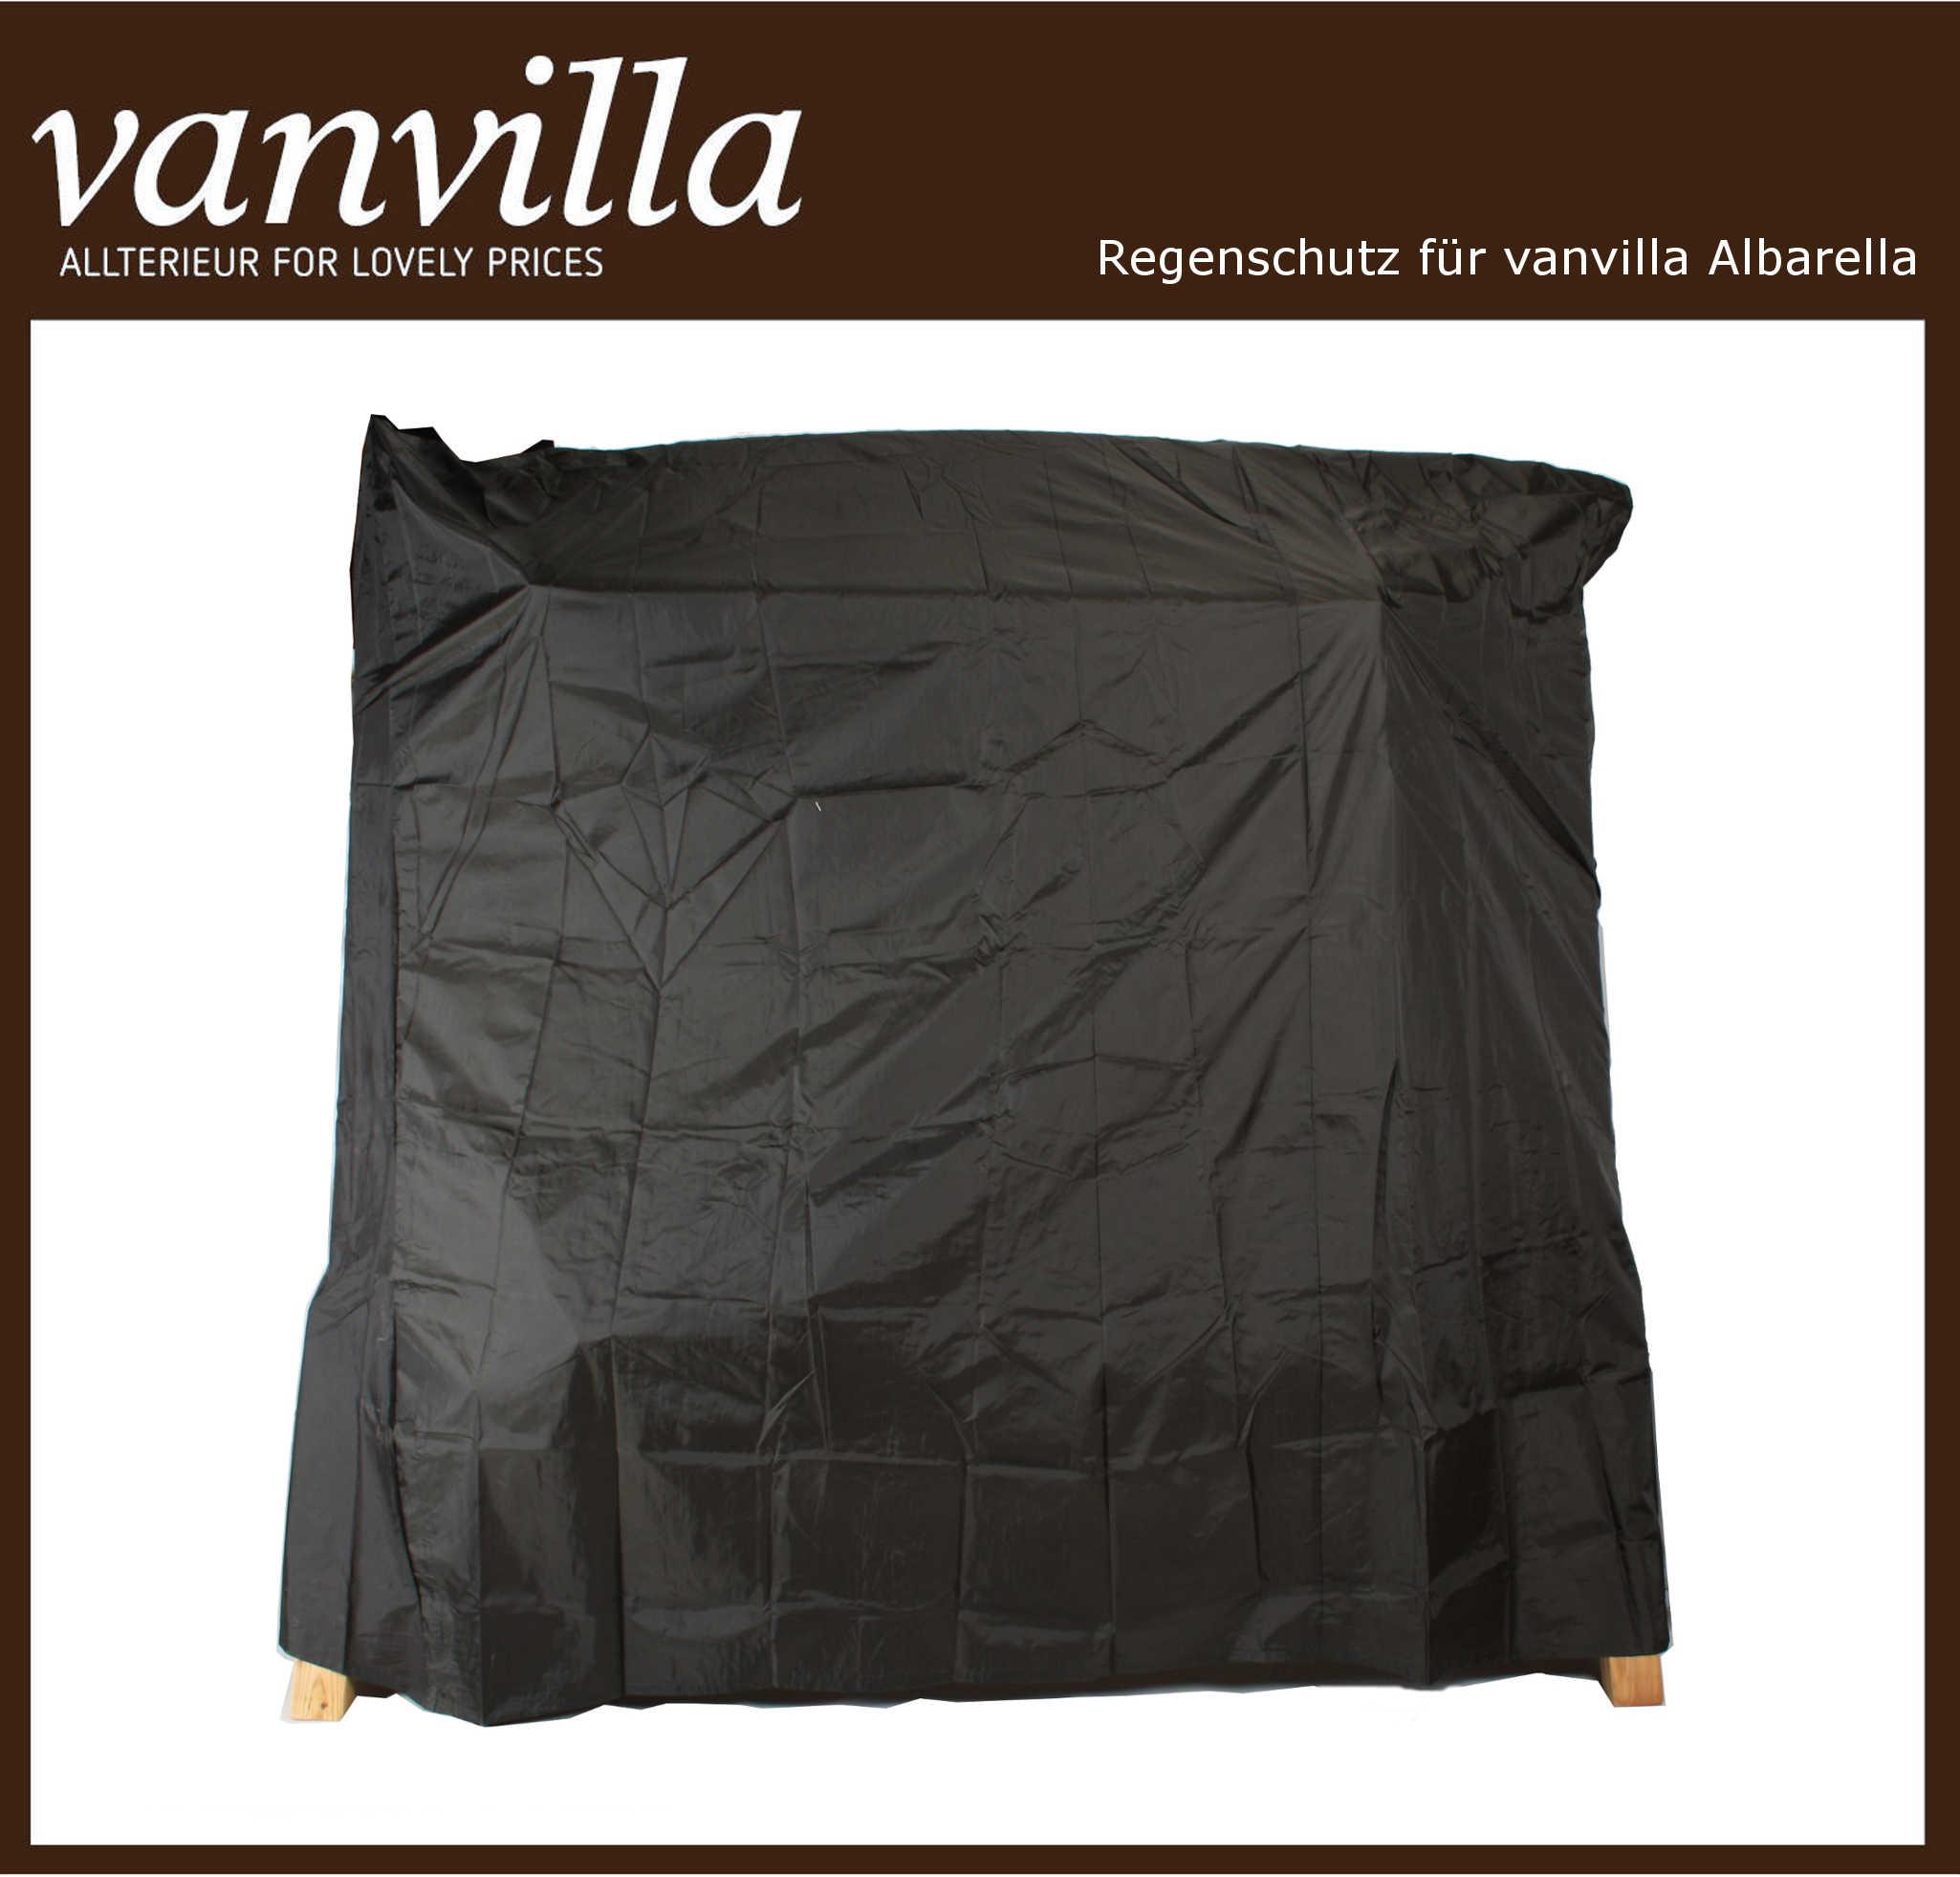 Regenschutz für vanvilla Hollywoodschaukel Albarella / Gomera